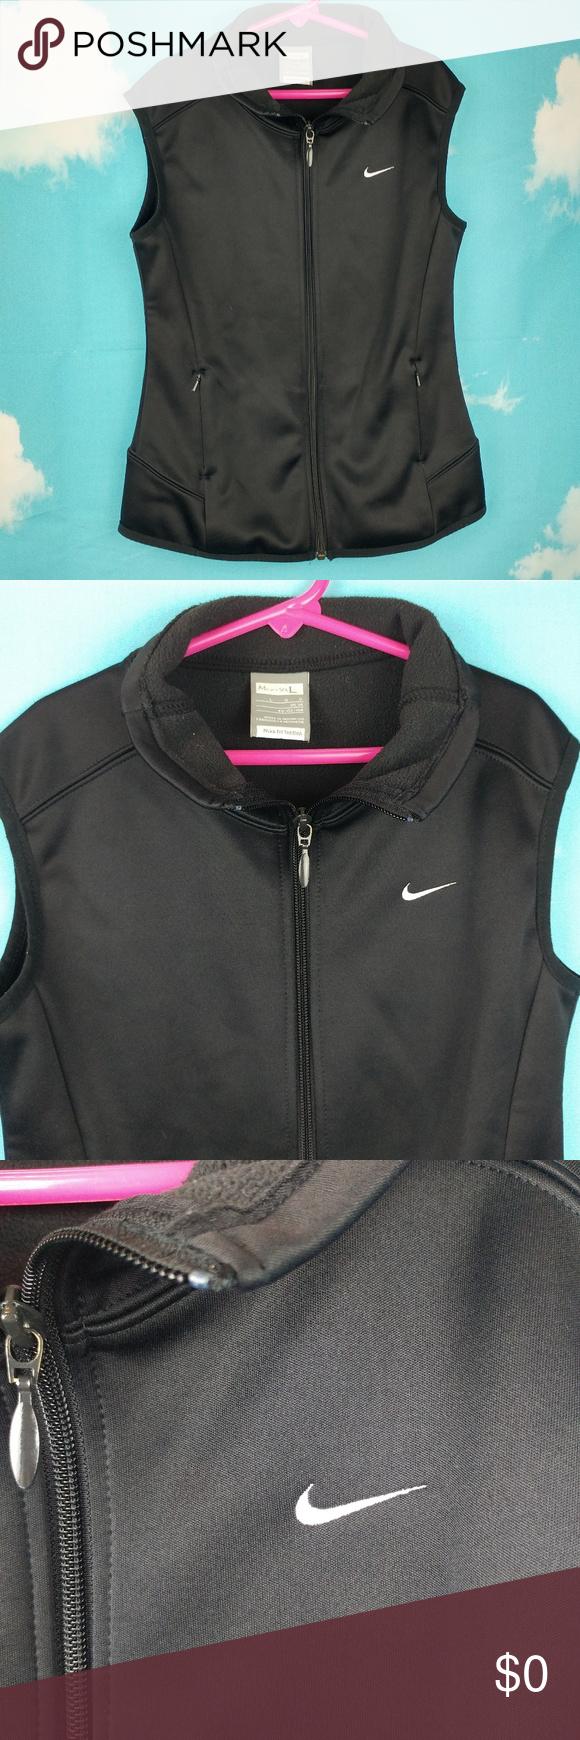 b18b379c26 Nike Youth Therma-Fit Fleece Vest Girls Boys 14 Nike Therma-Fit Fleece Full